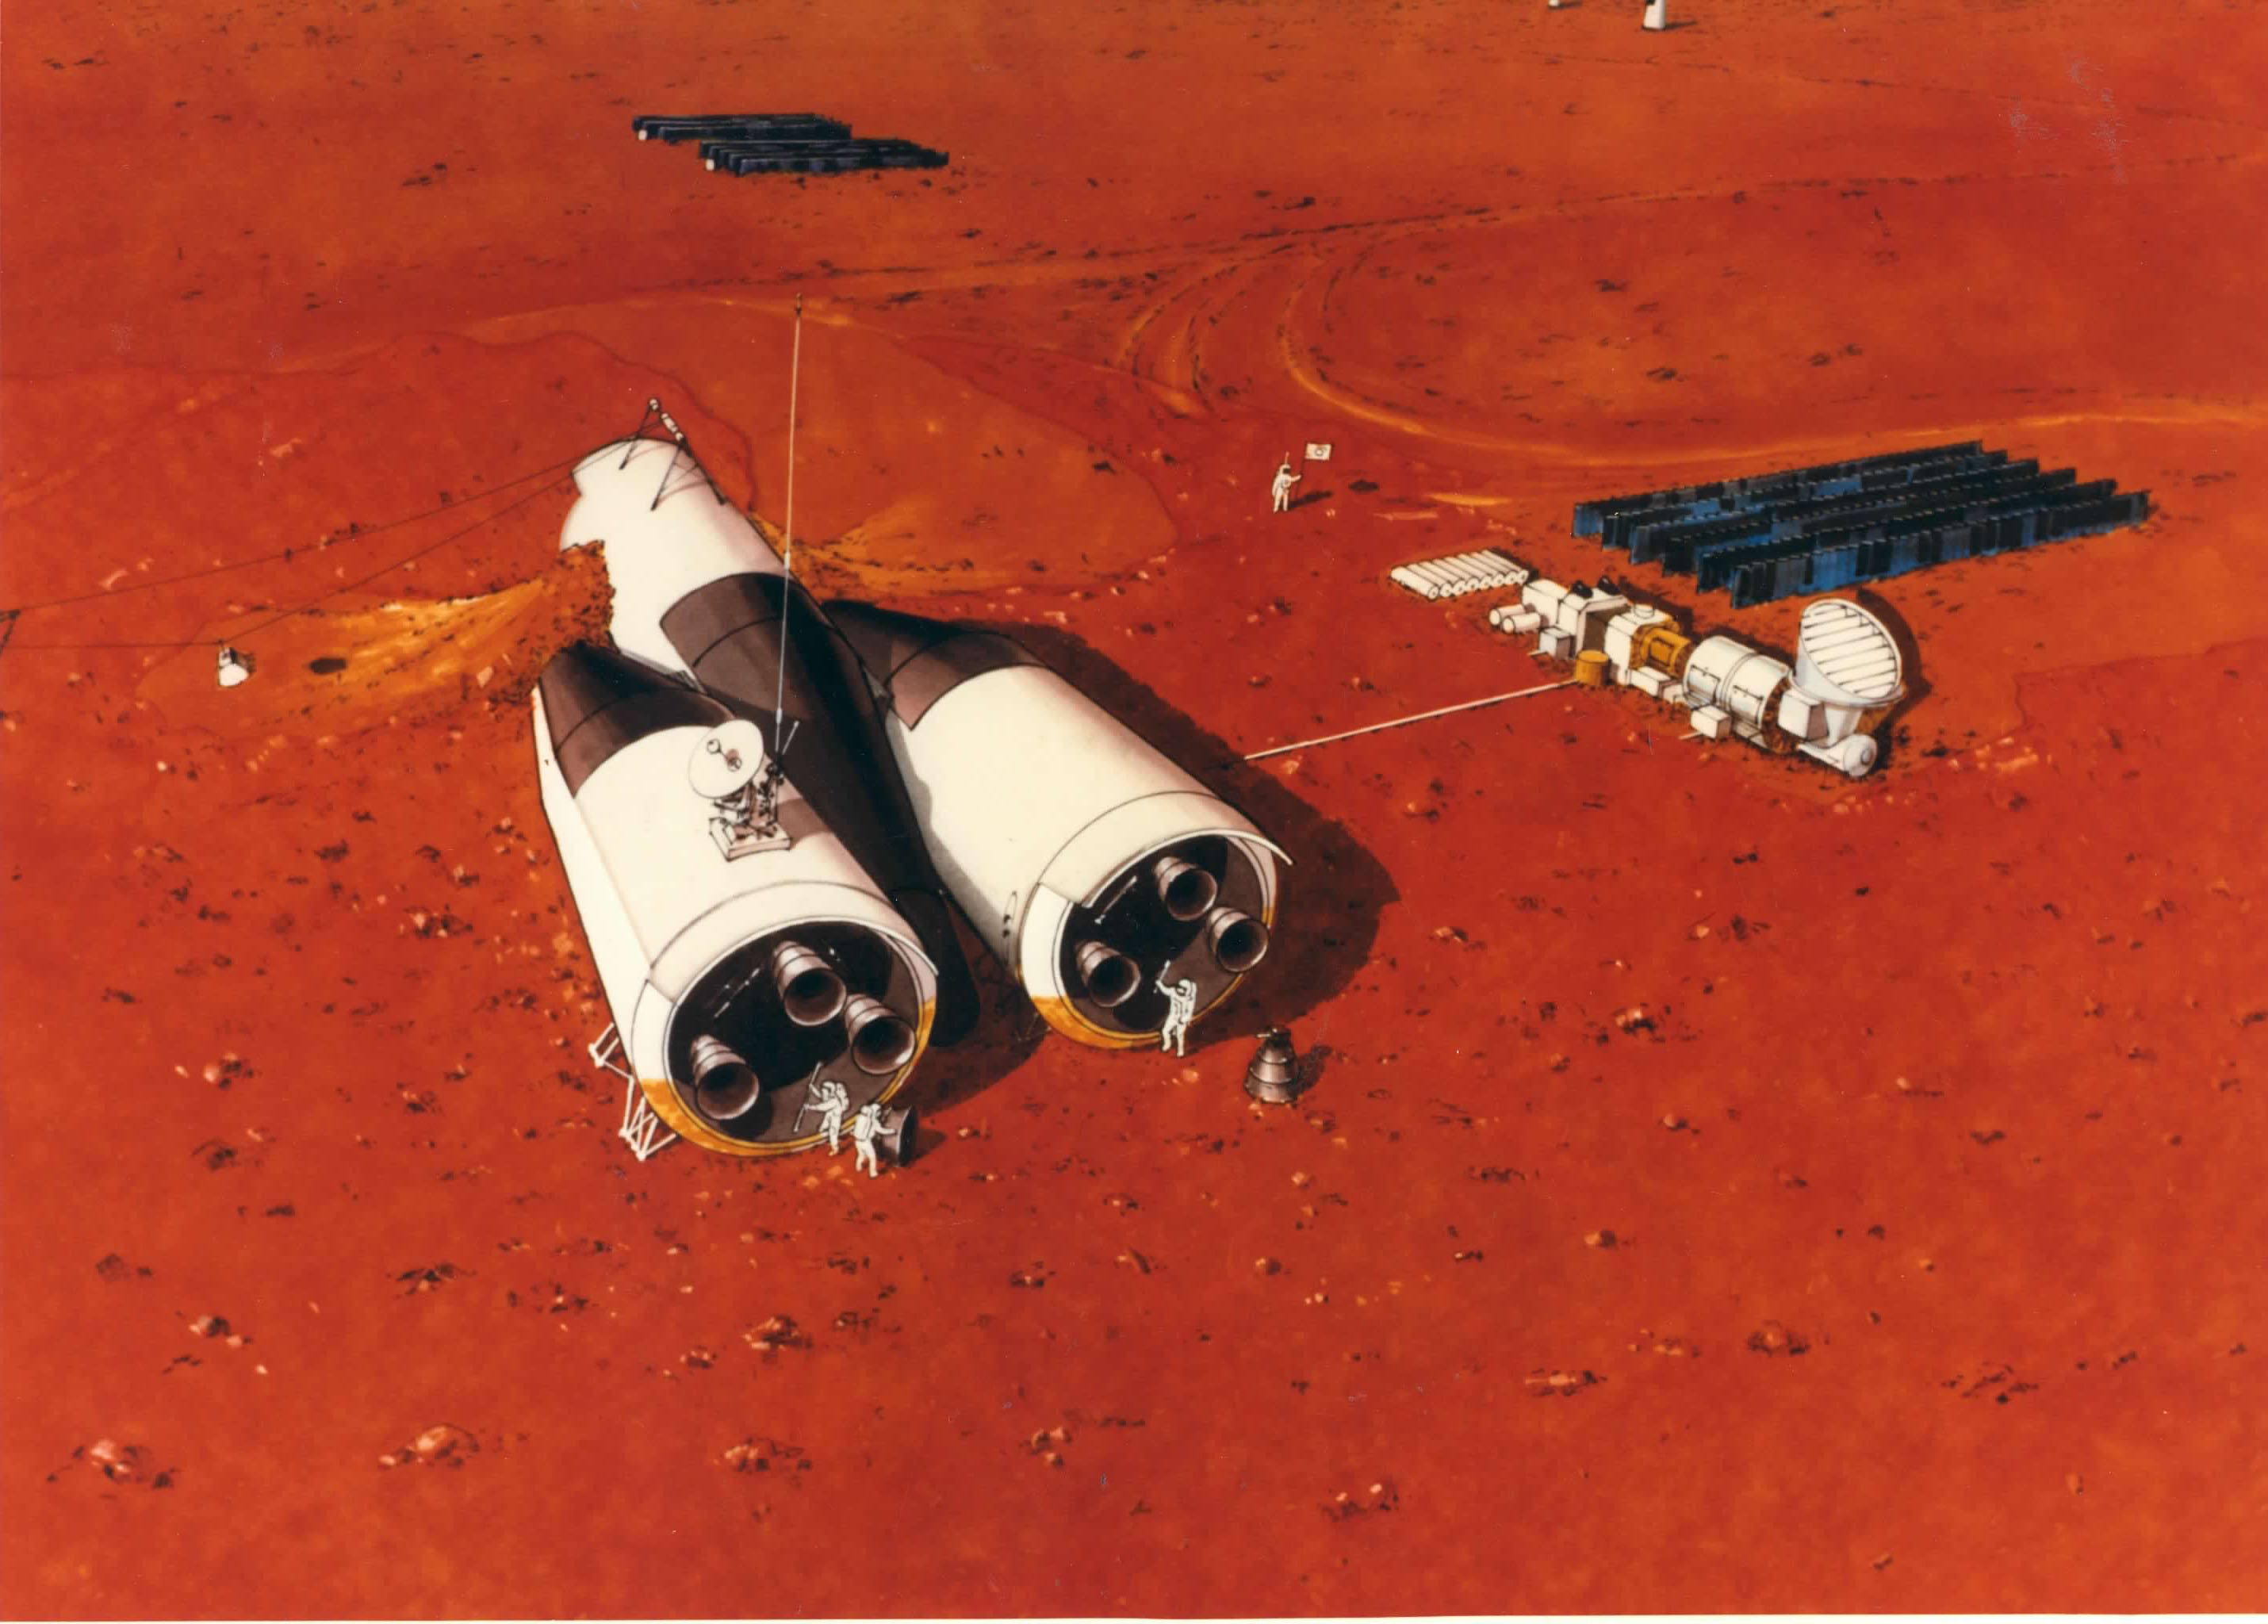 NASA - Mars Missions